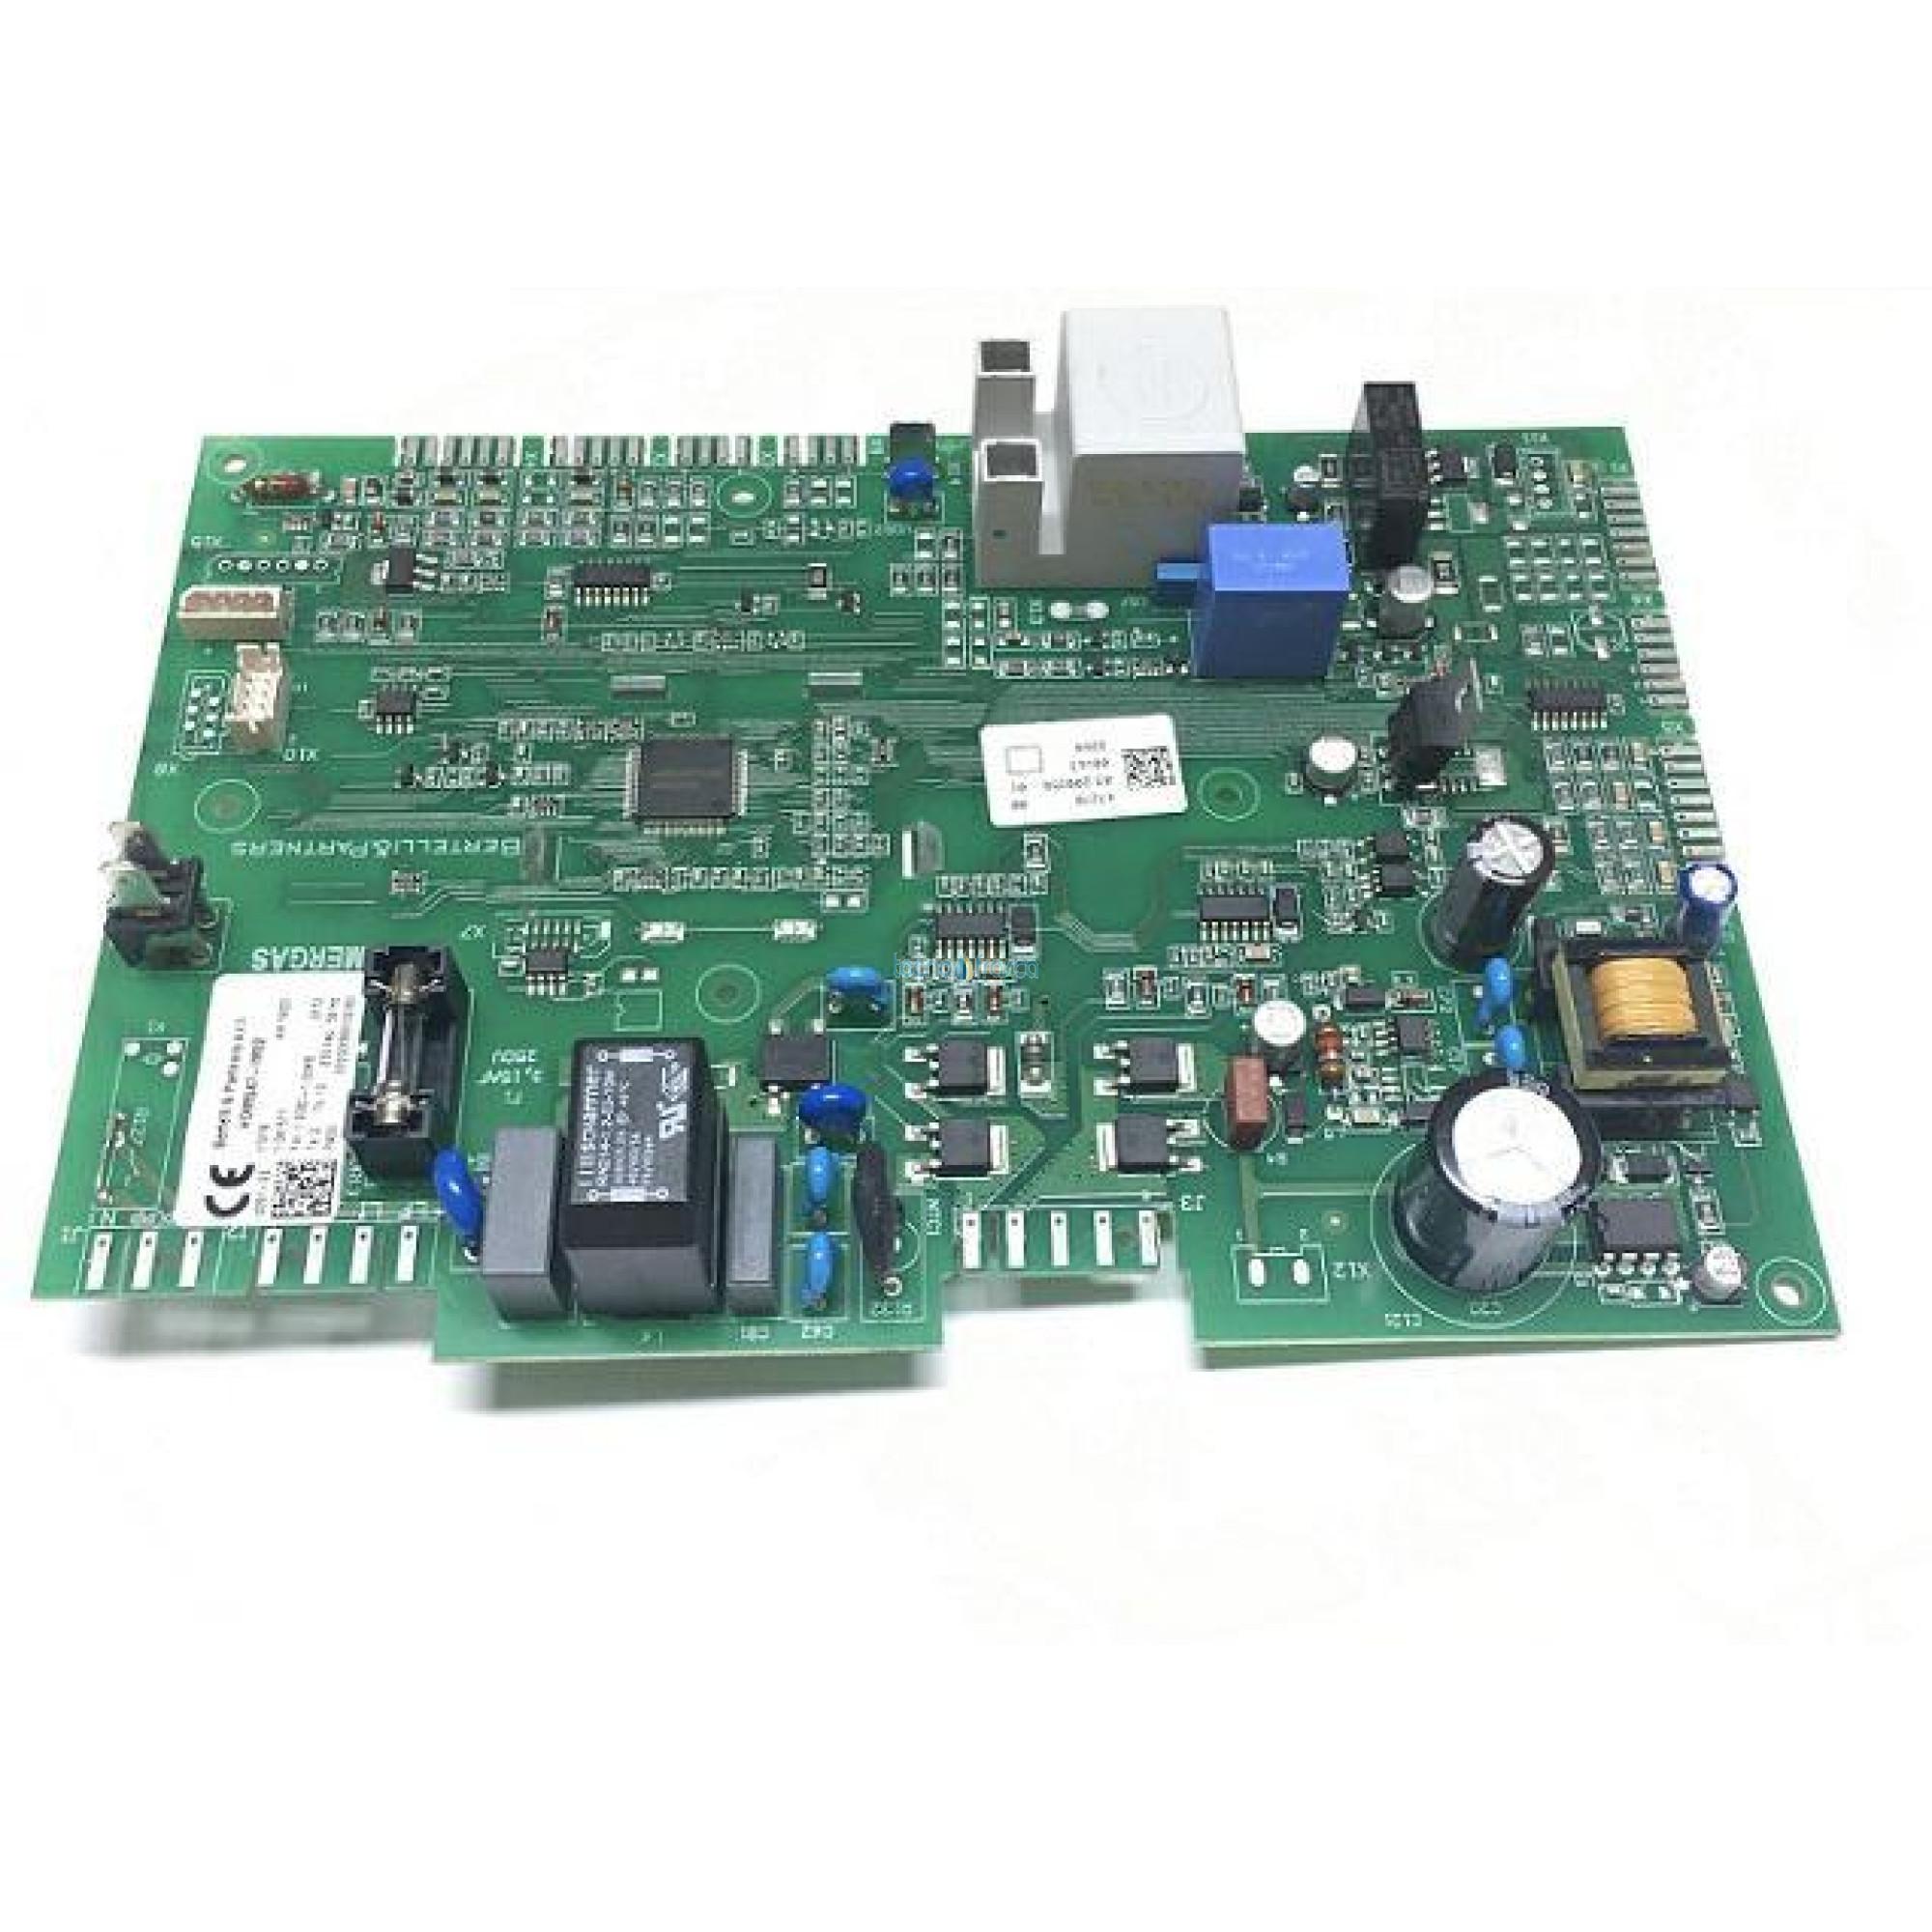 Immergas scheda elettronica victrix tera 1.041577